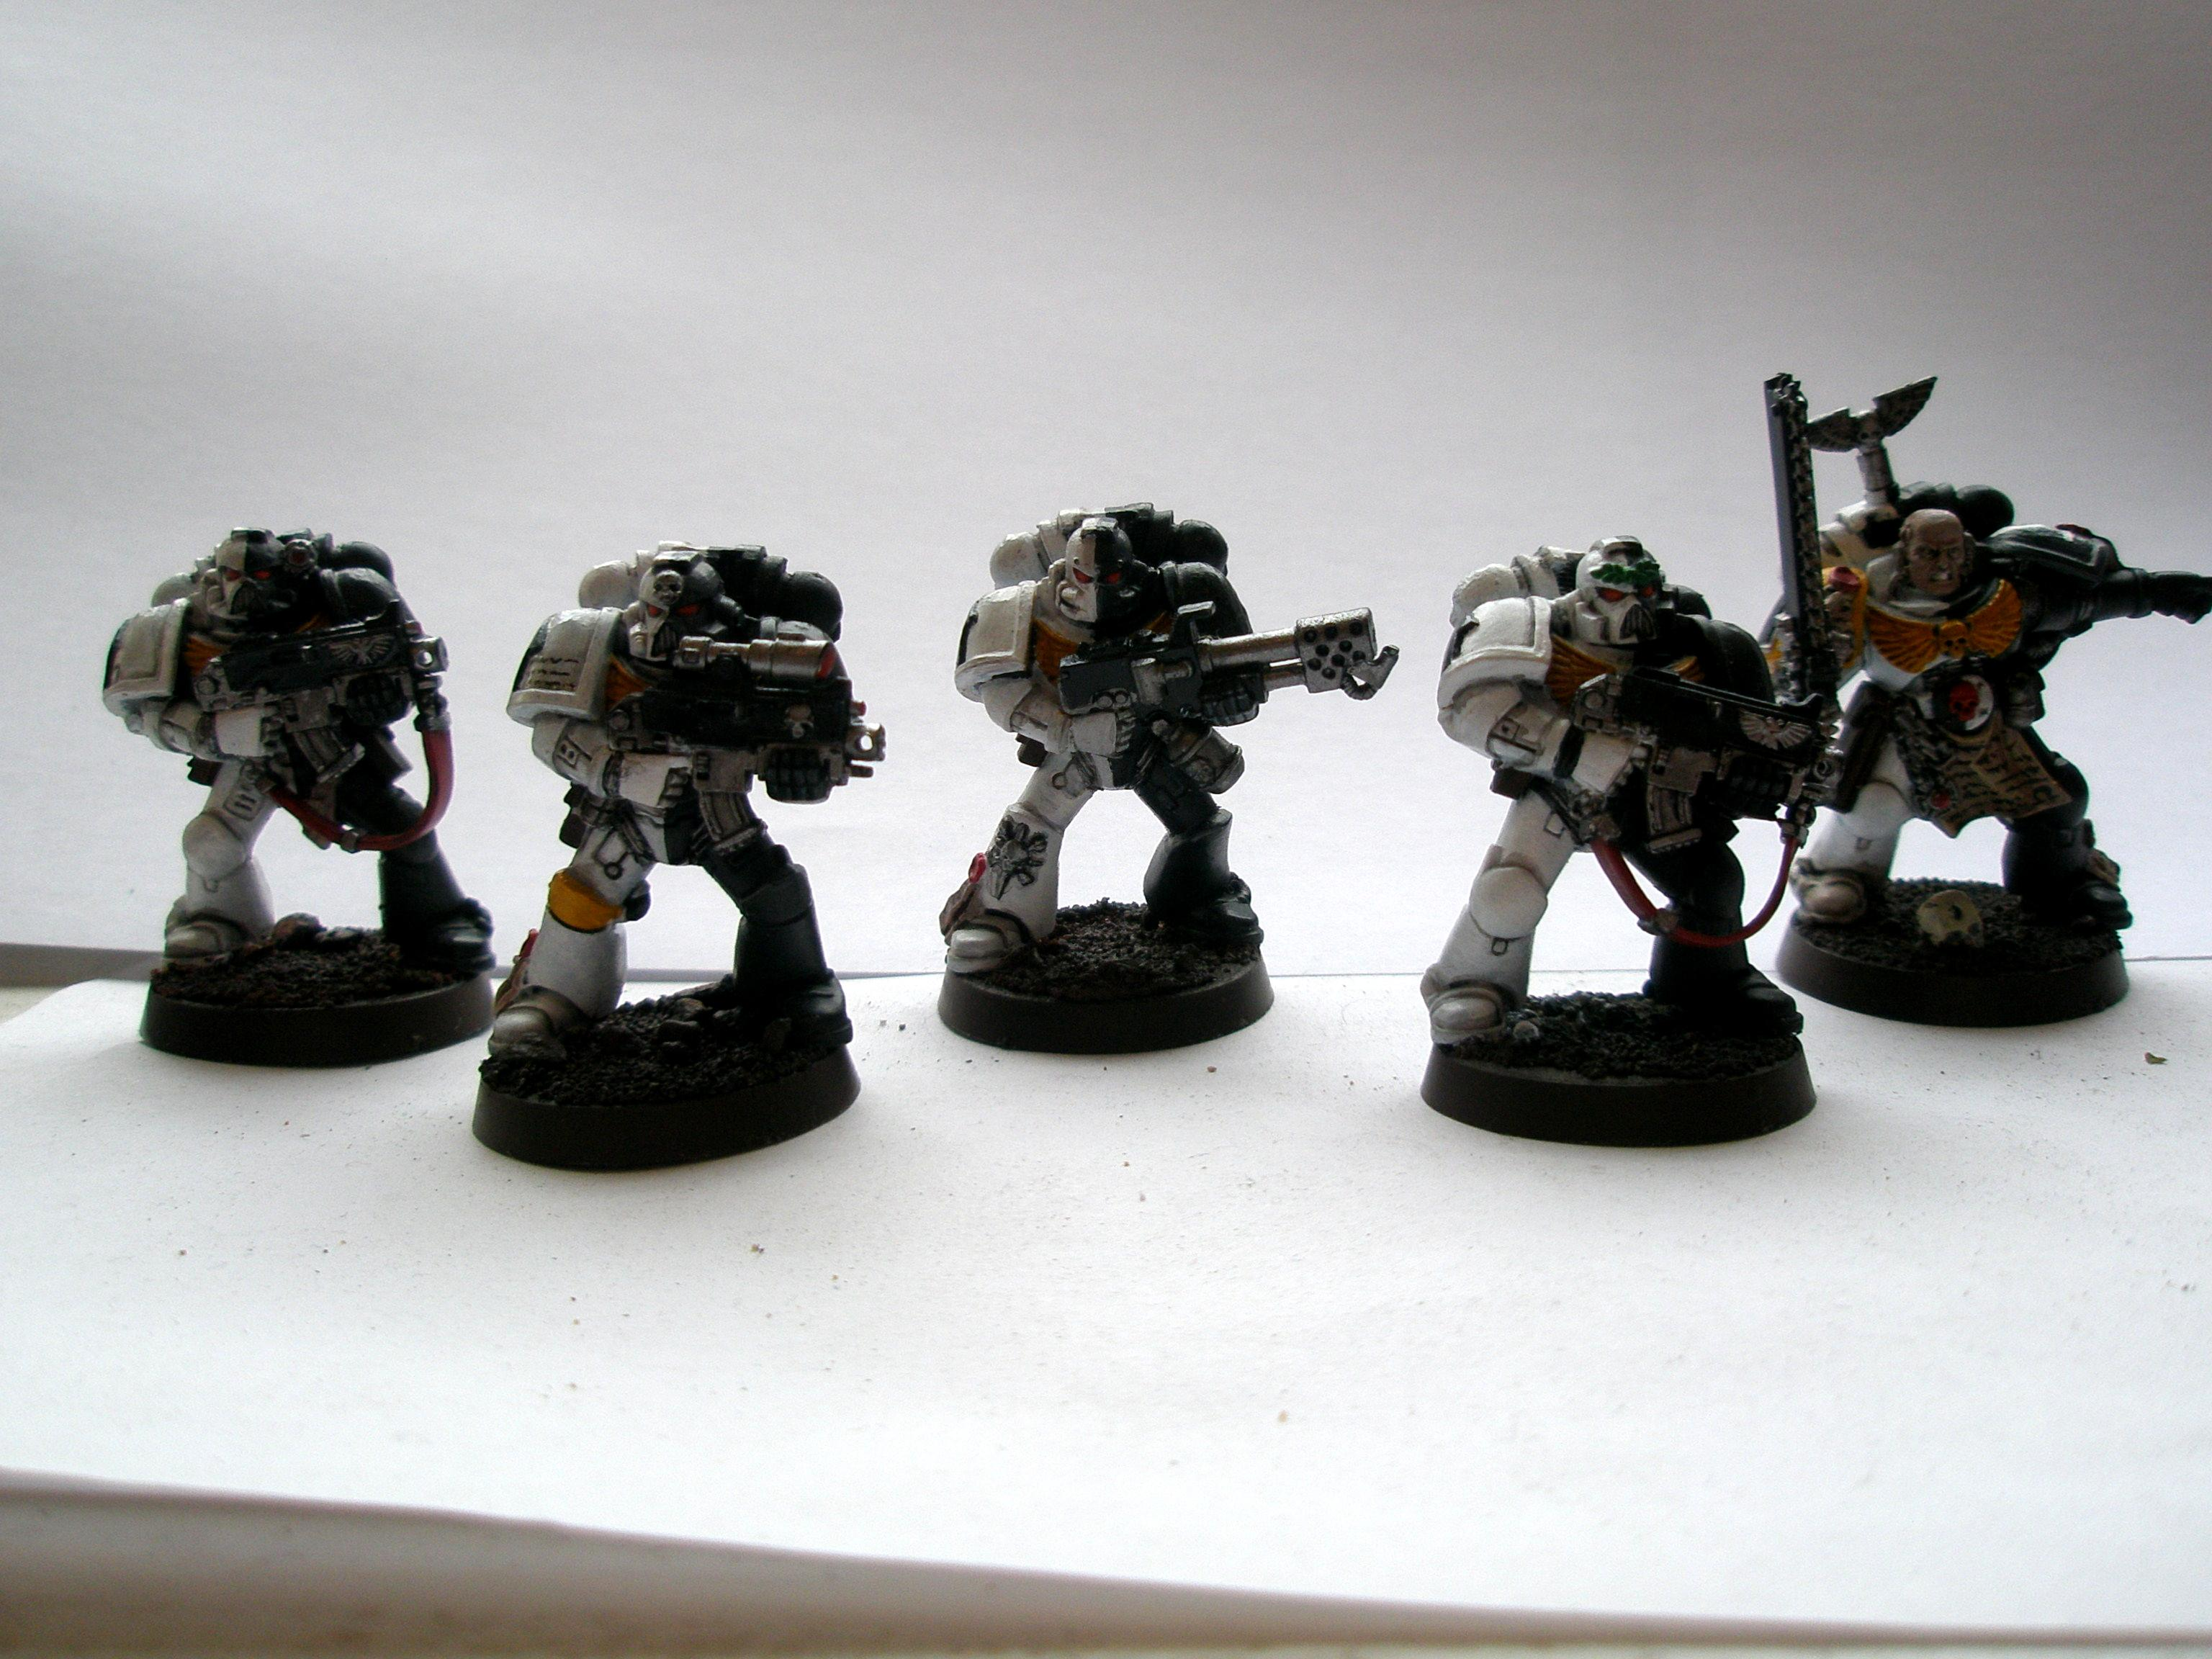 40 000, Black, Omega, Space, Space Marines, Warhammer 40,000, White